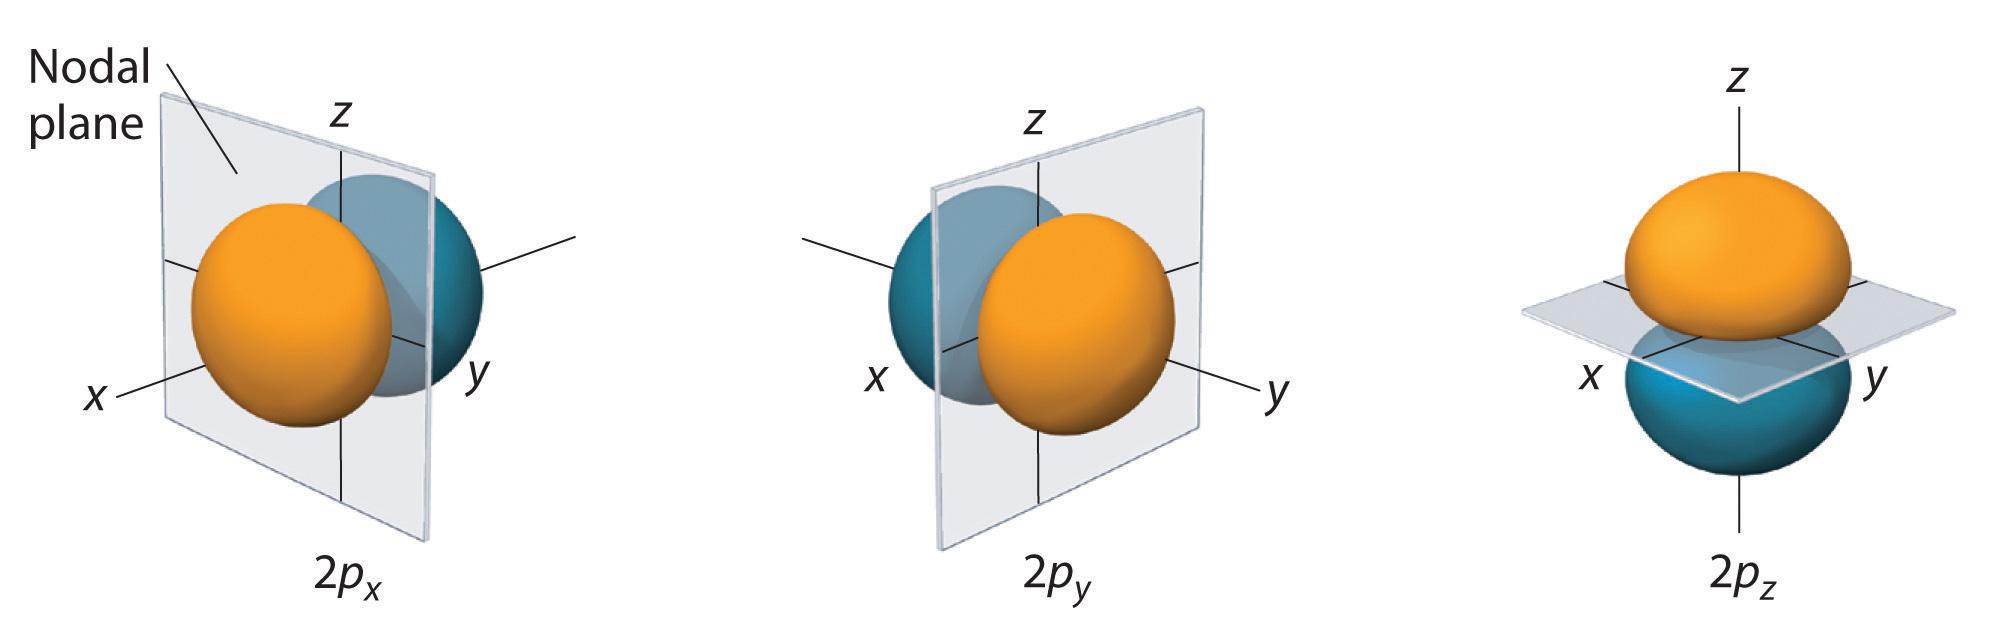 chemwiki.ucdavis.edu/Wikitexts/Howard_University/General_Chemistry%3A_An_Atoms_First_Approach